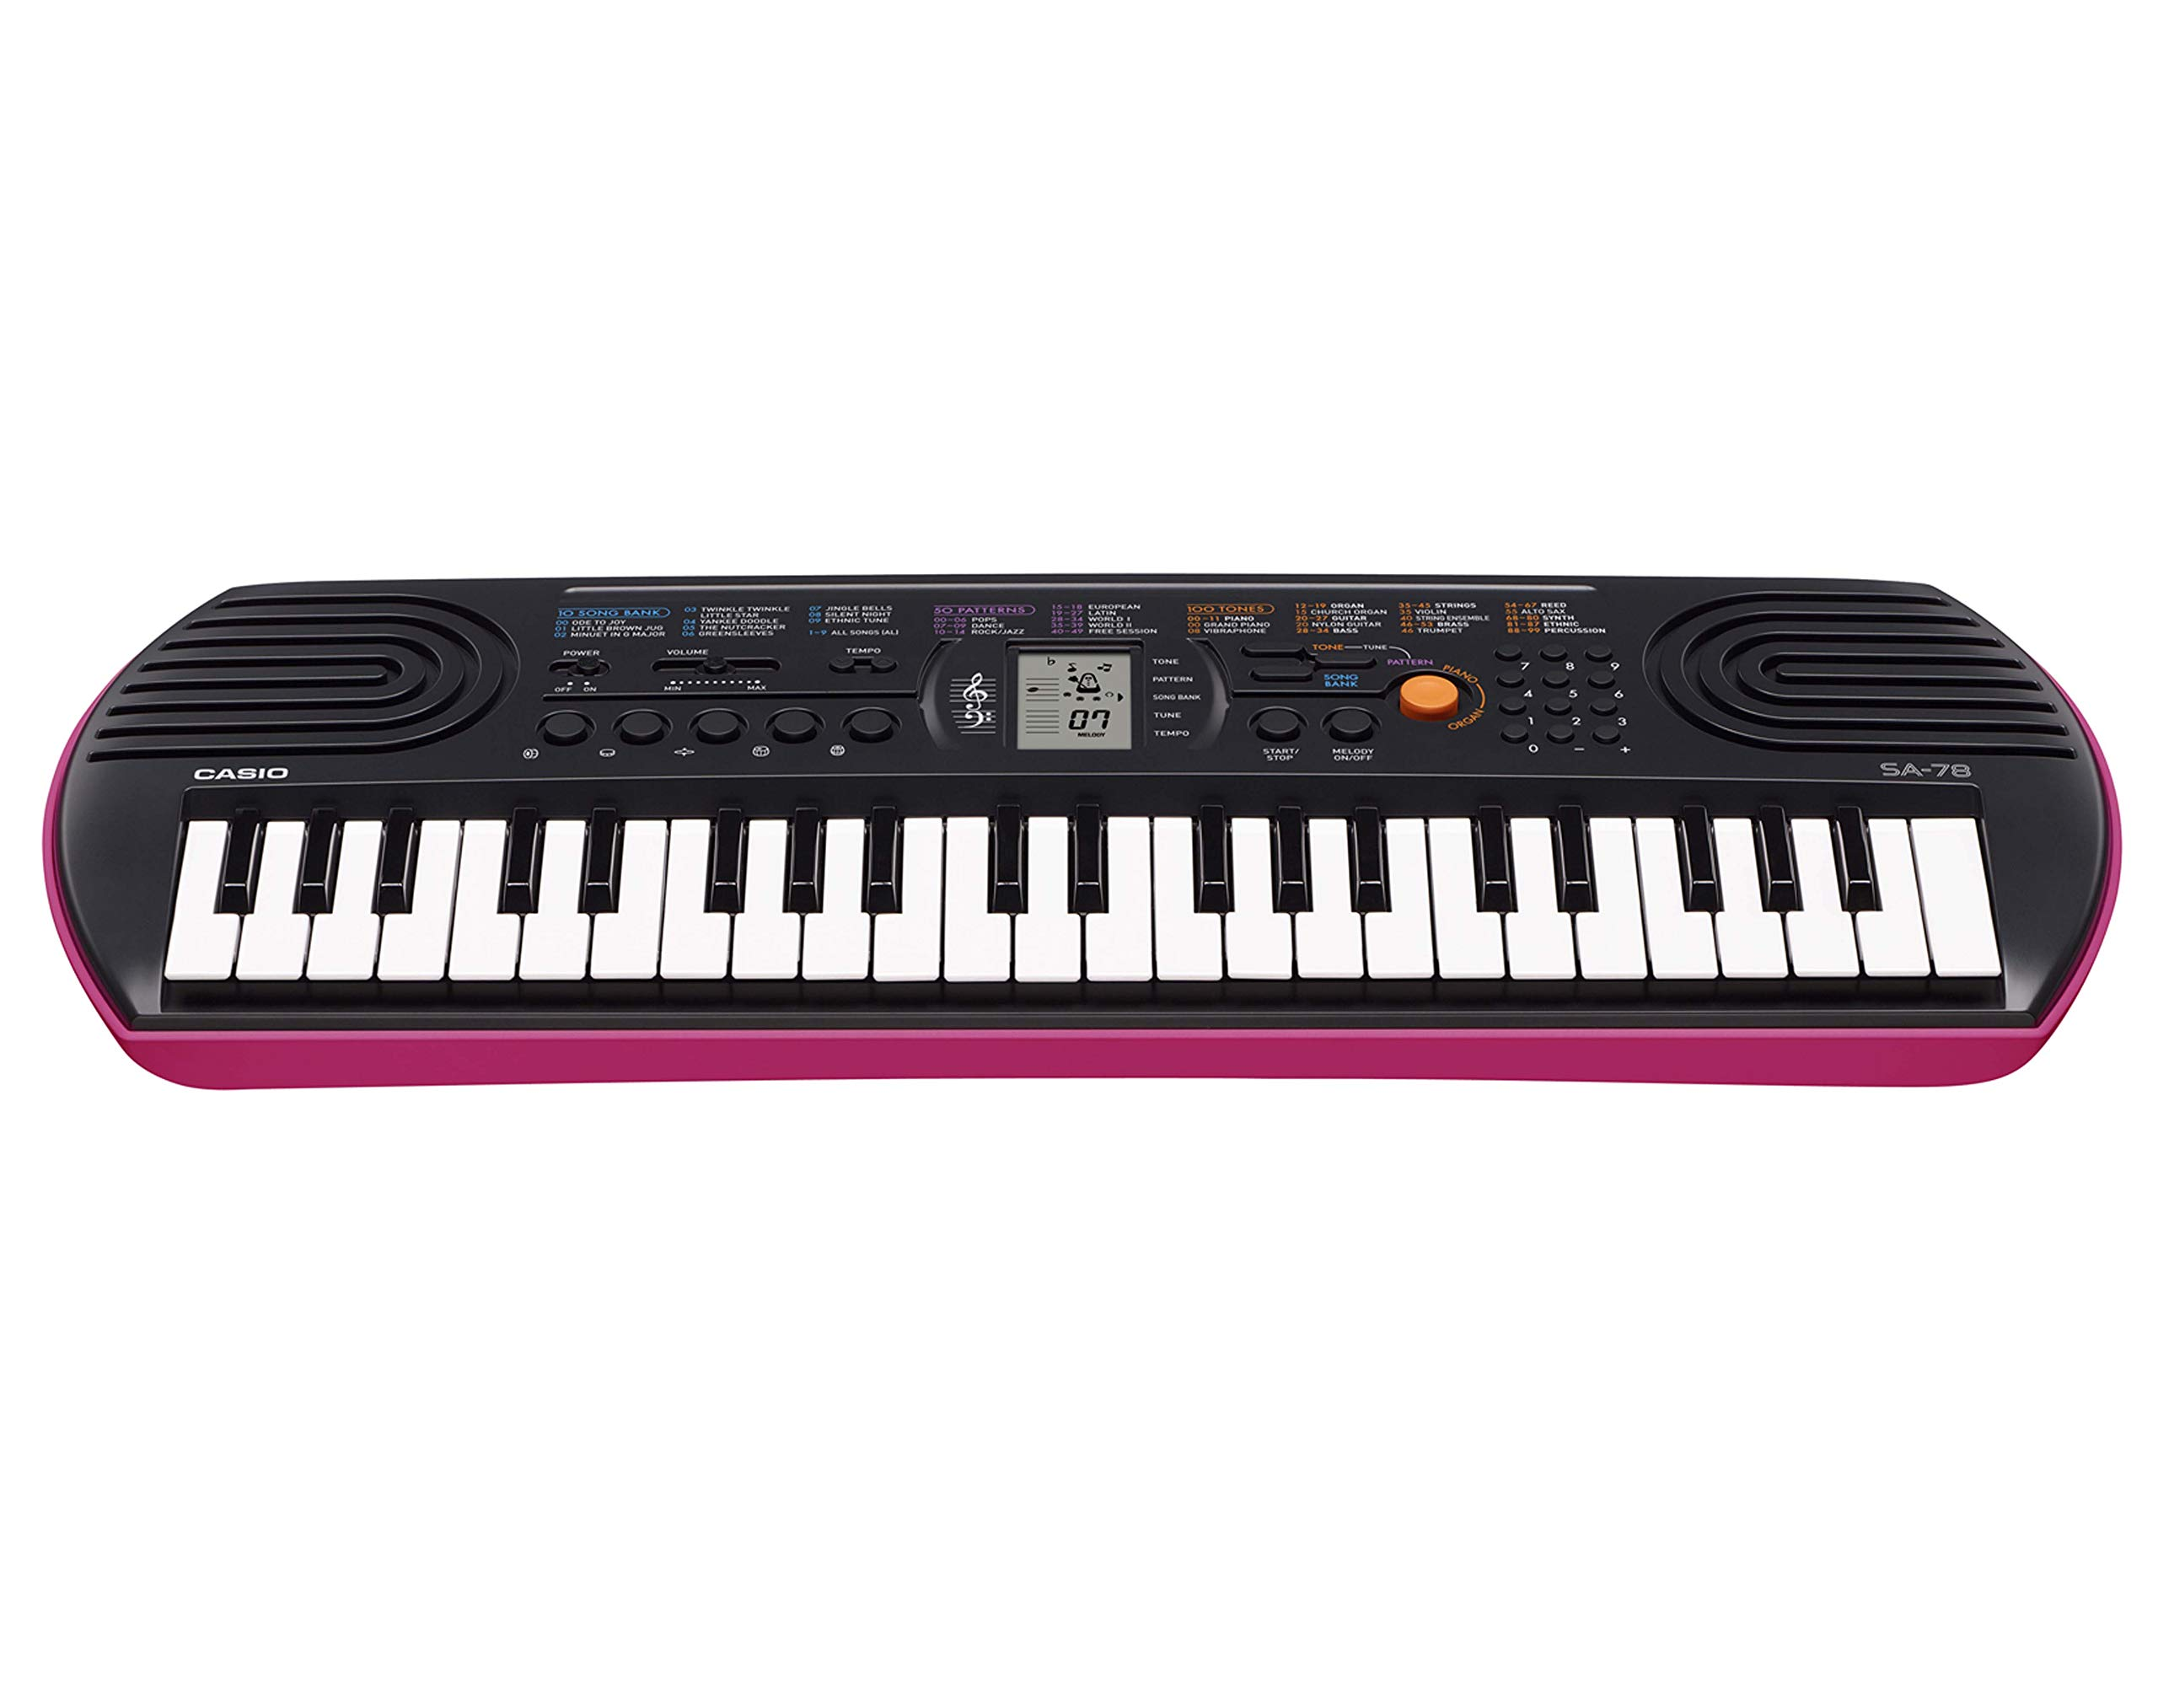 Casio SA-78 44-Key Mini Personal Keyboard by Casio (Image #3)